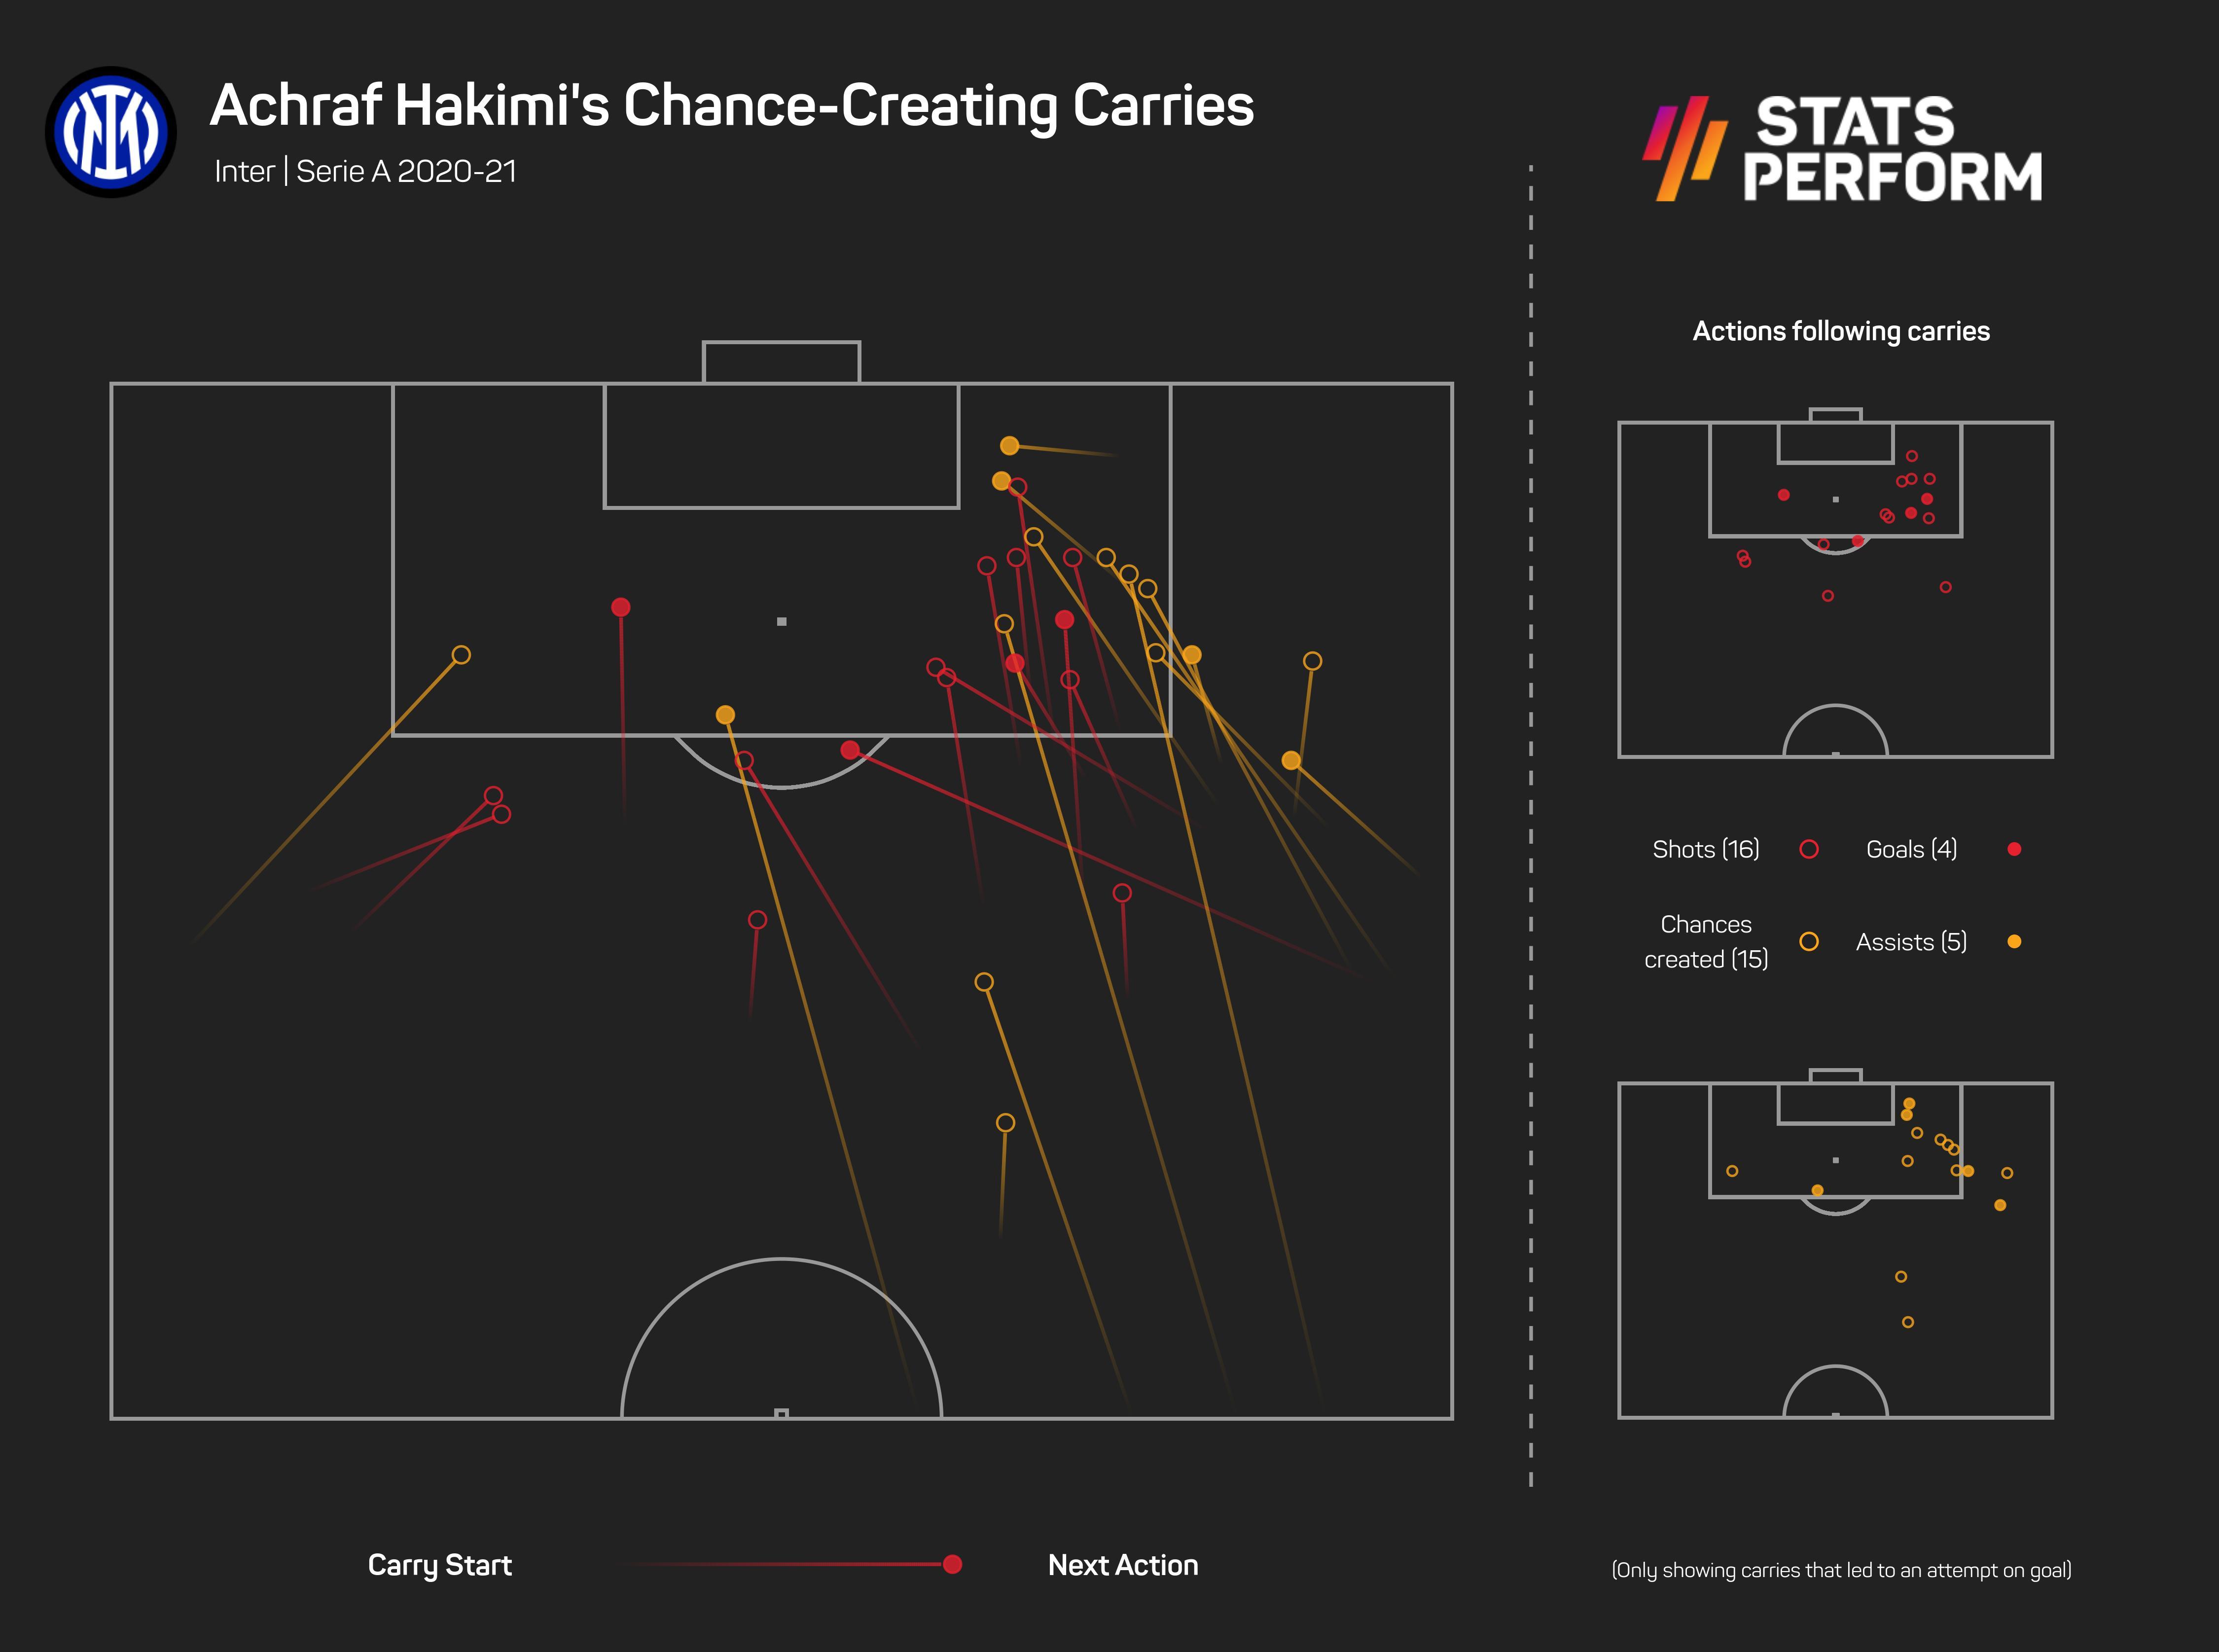 Achraf Hakimi's chance-creating carries